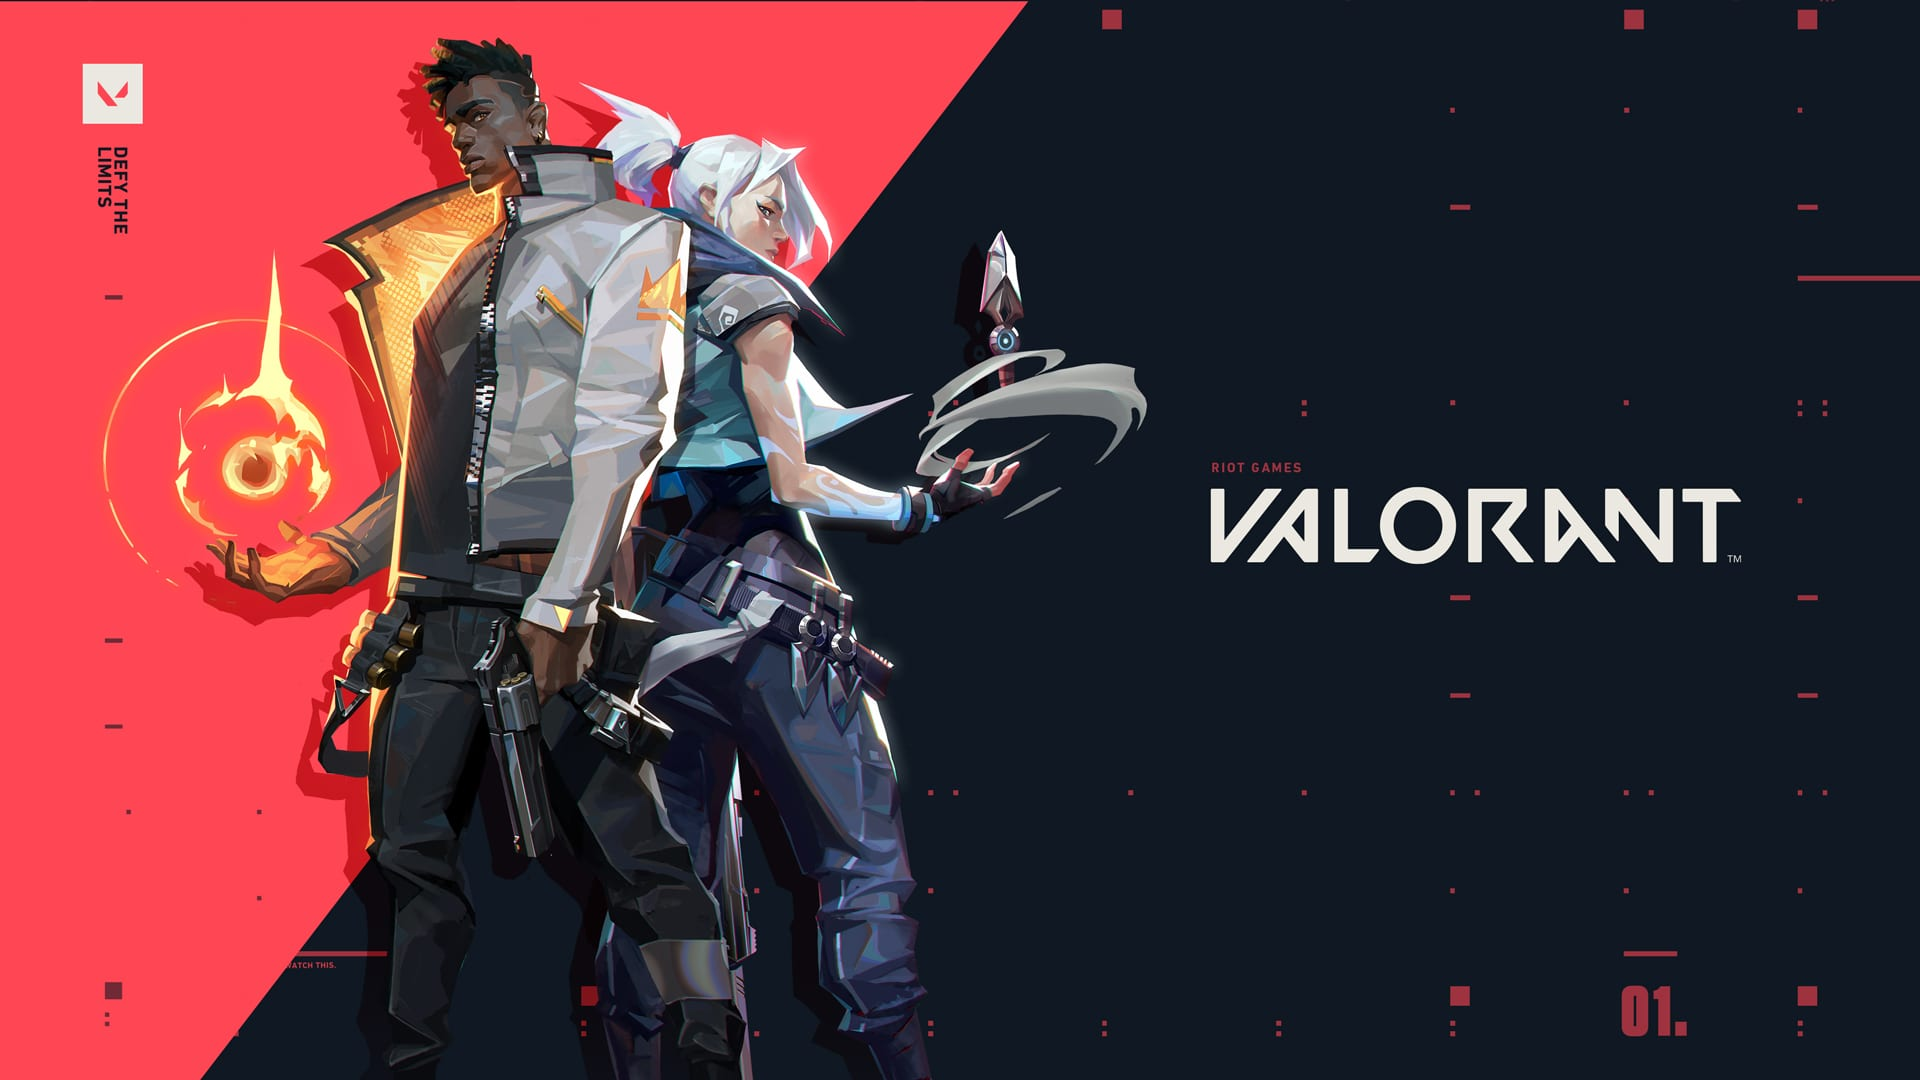 valorant patch 2.05